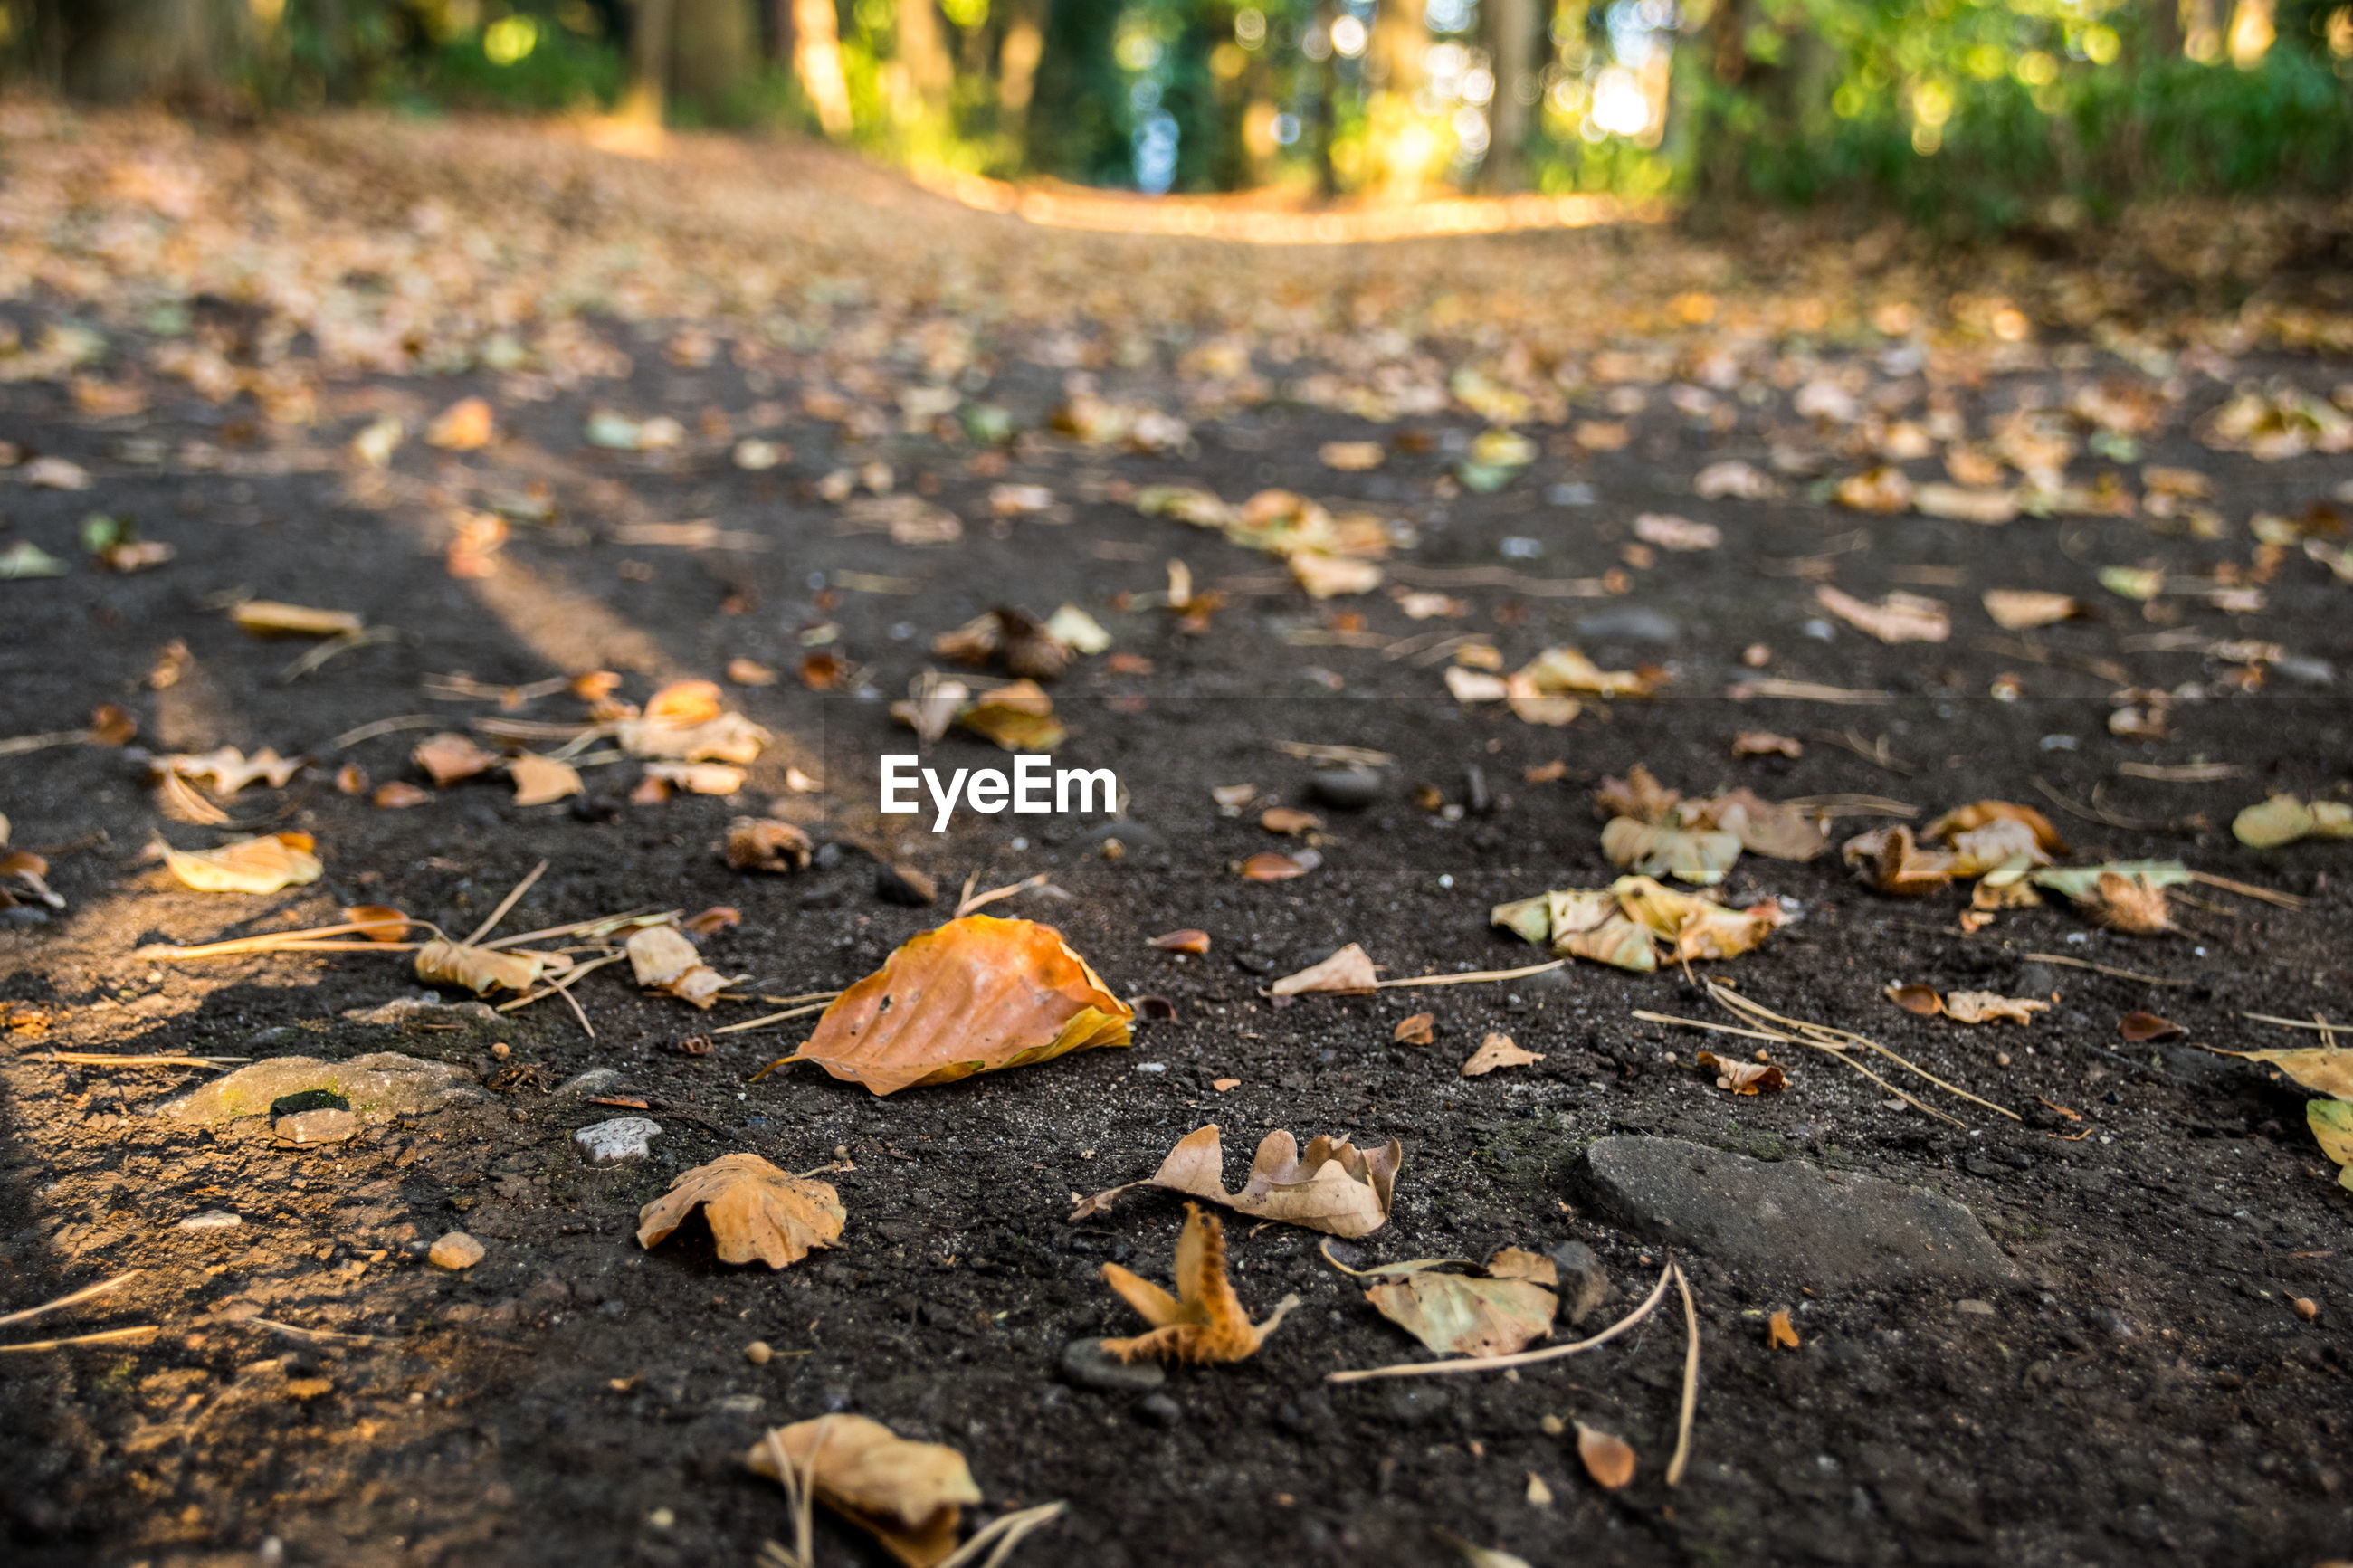 Dry leaves on road